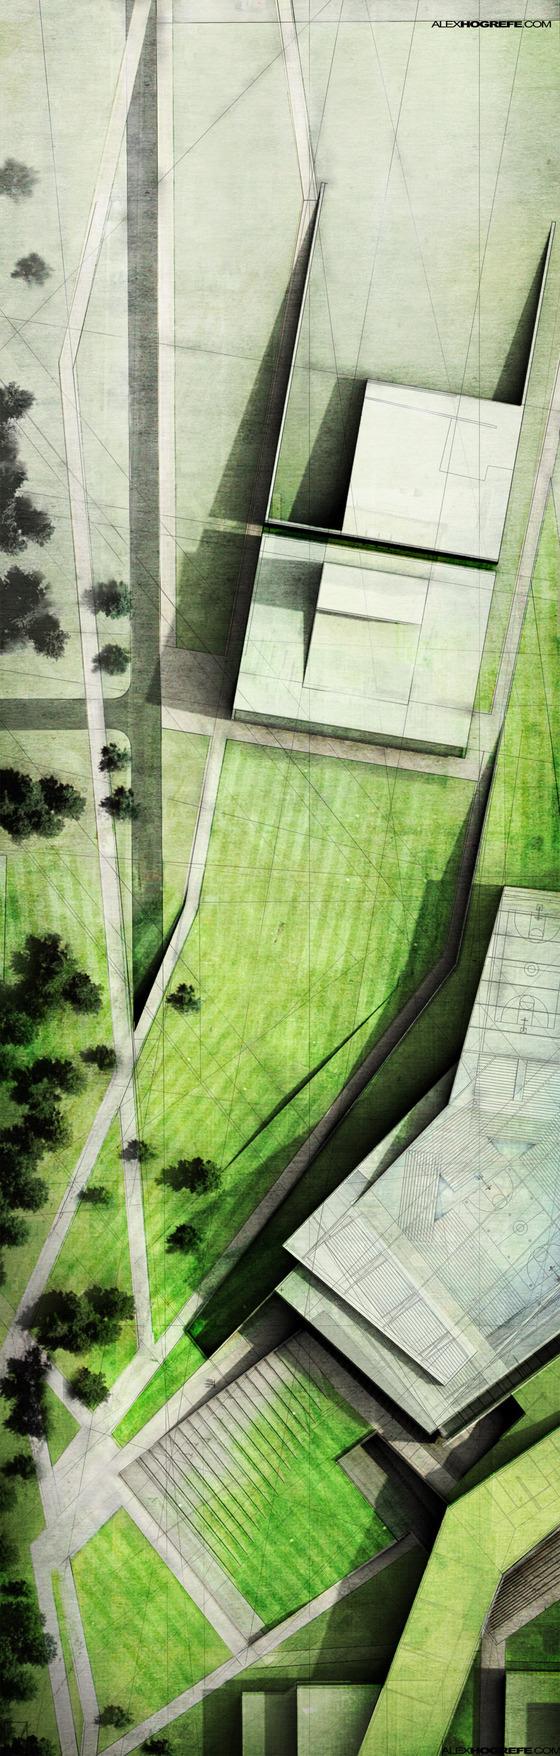 BLOG – architectural rendering and illustration blog